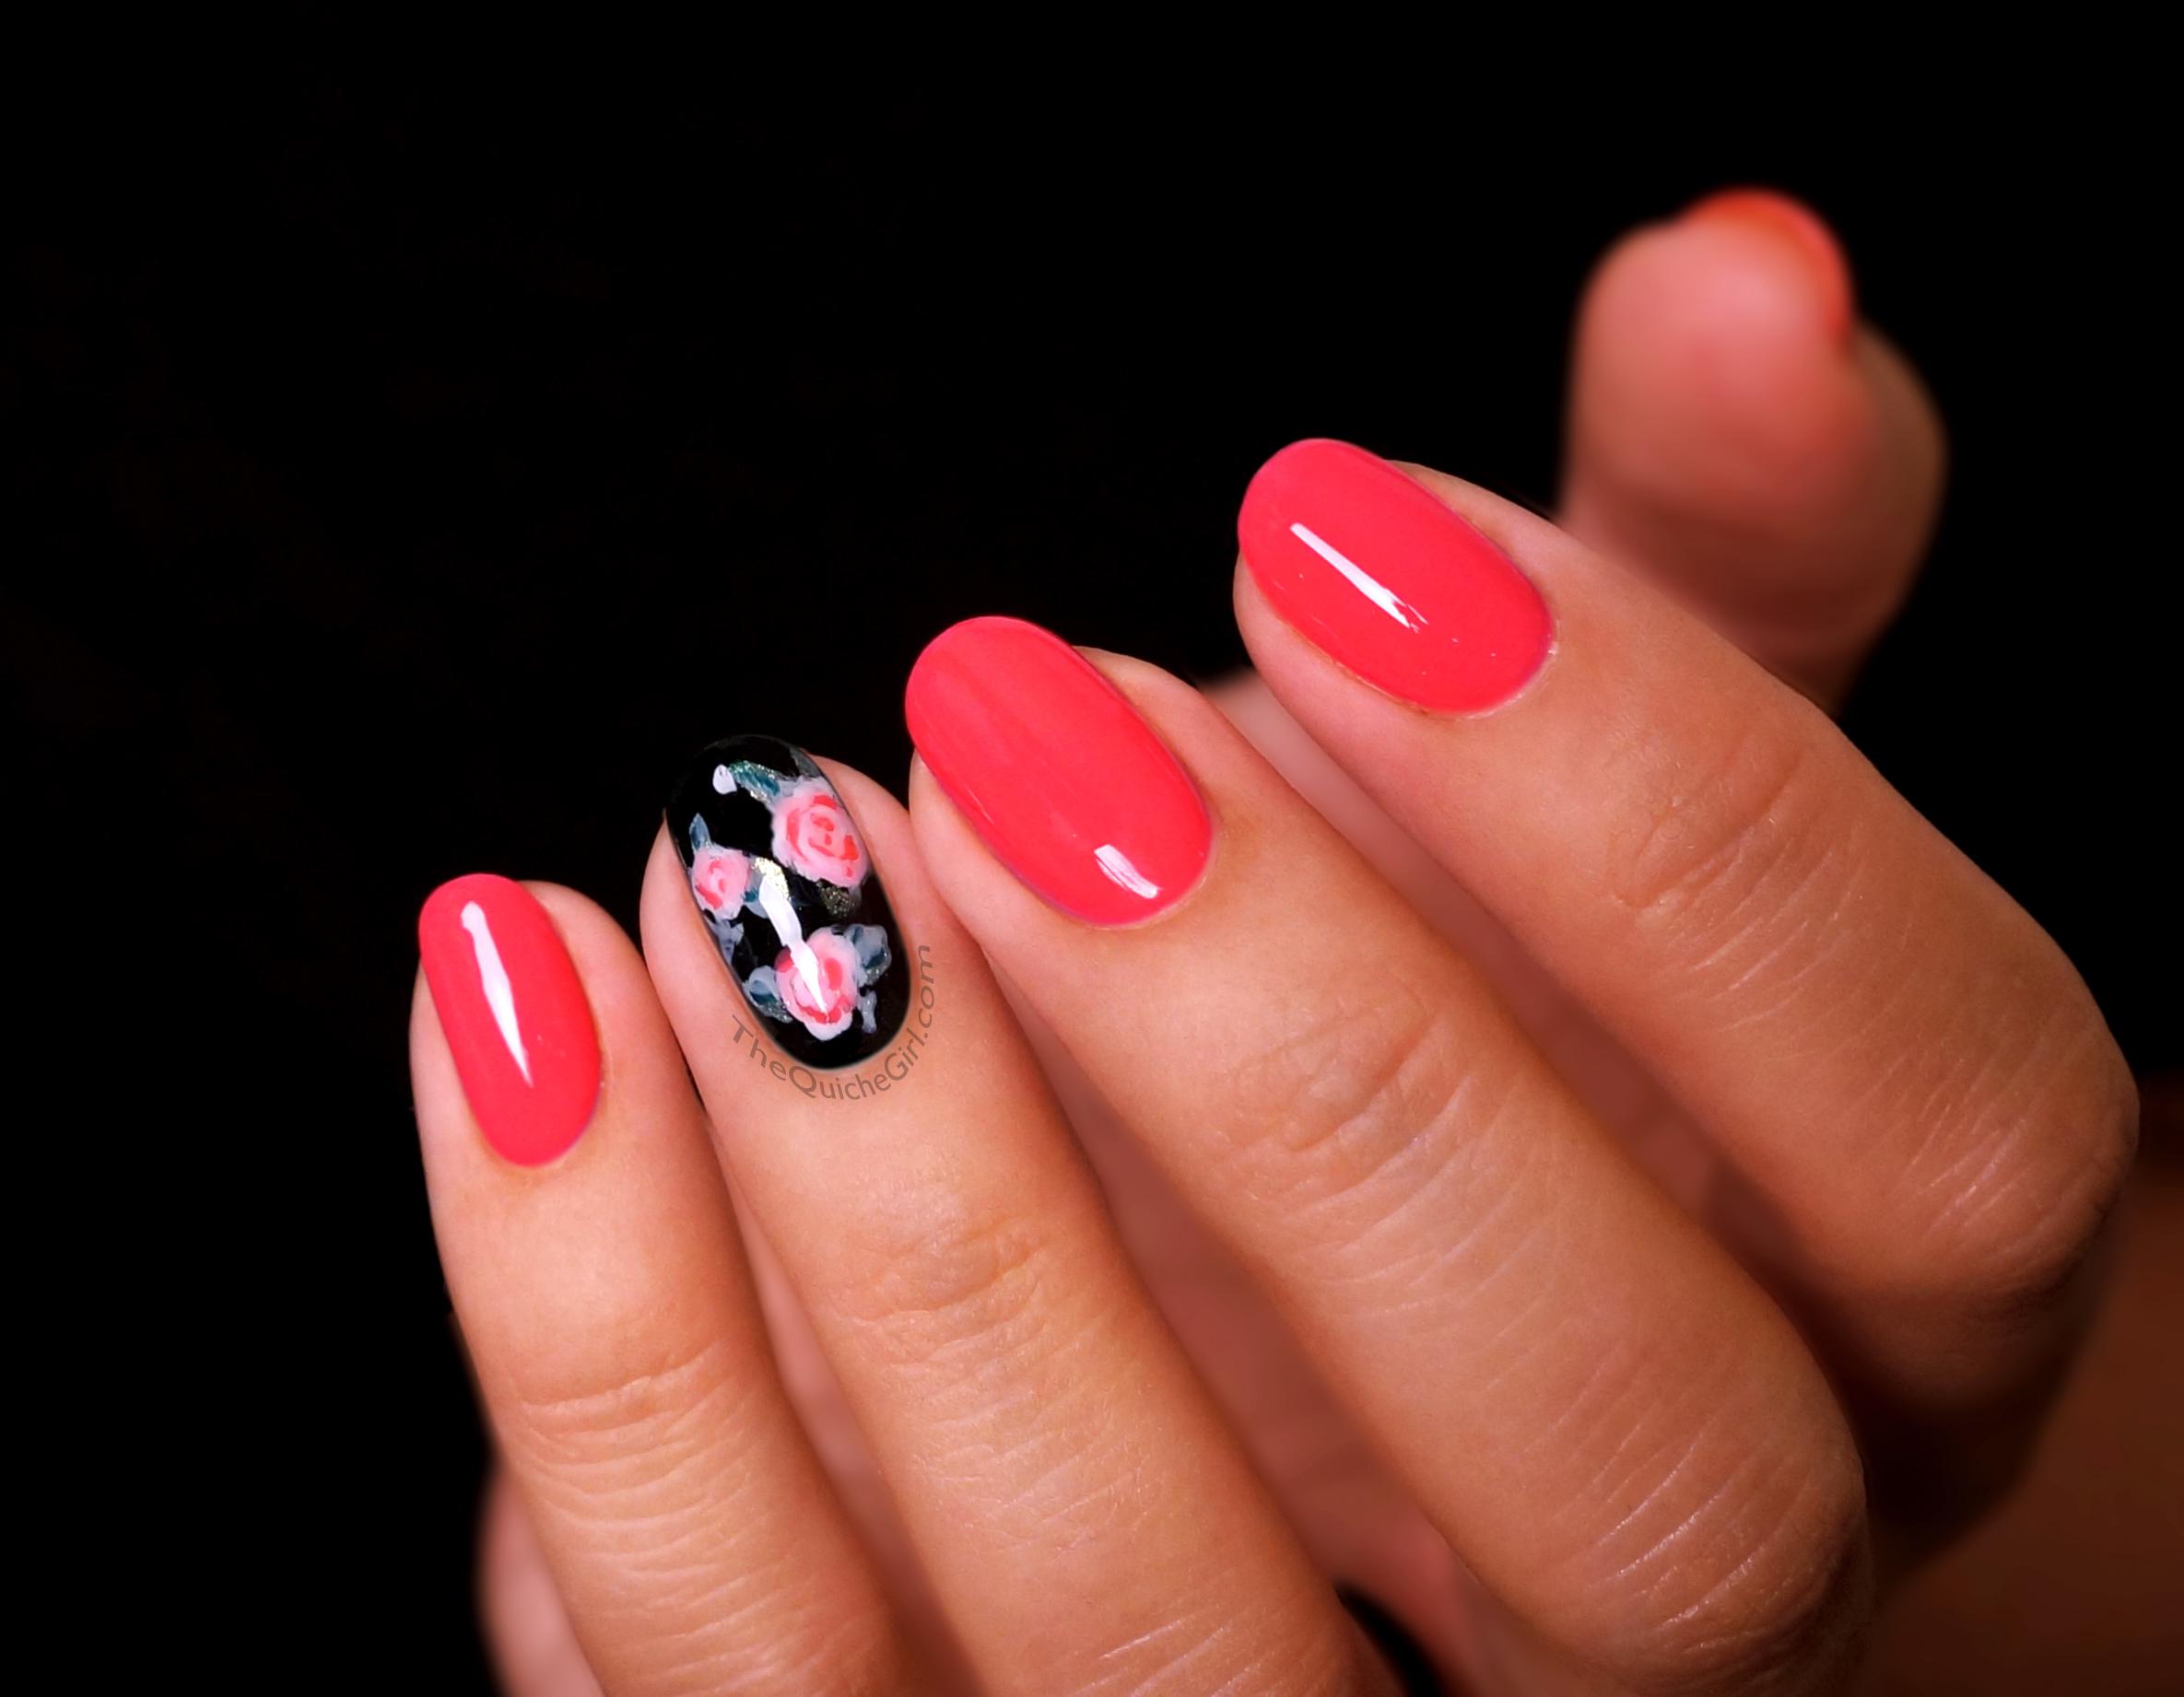 Laka rose s la blogo fait pshiiit quichegirl - Forme d ongle ...